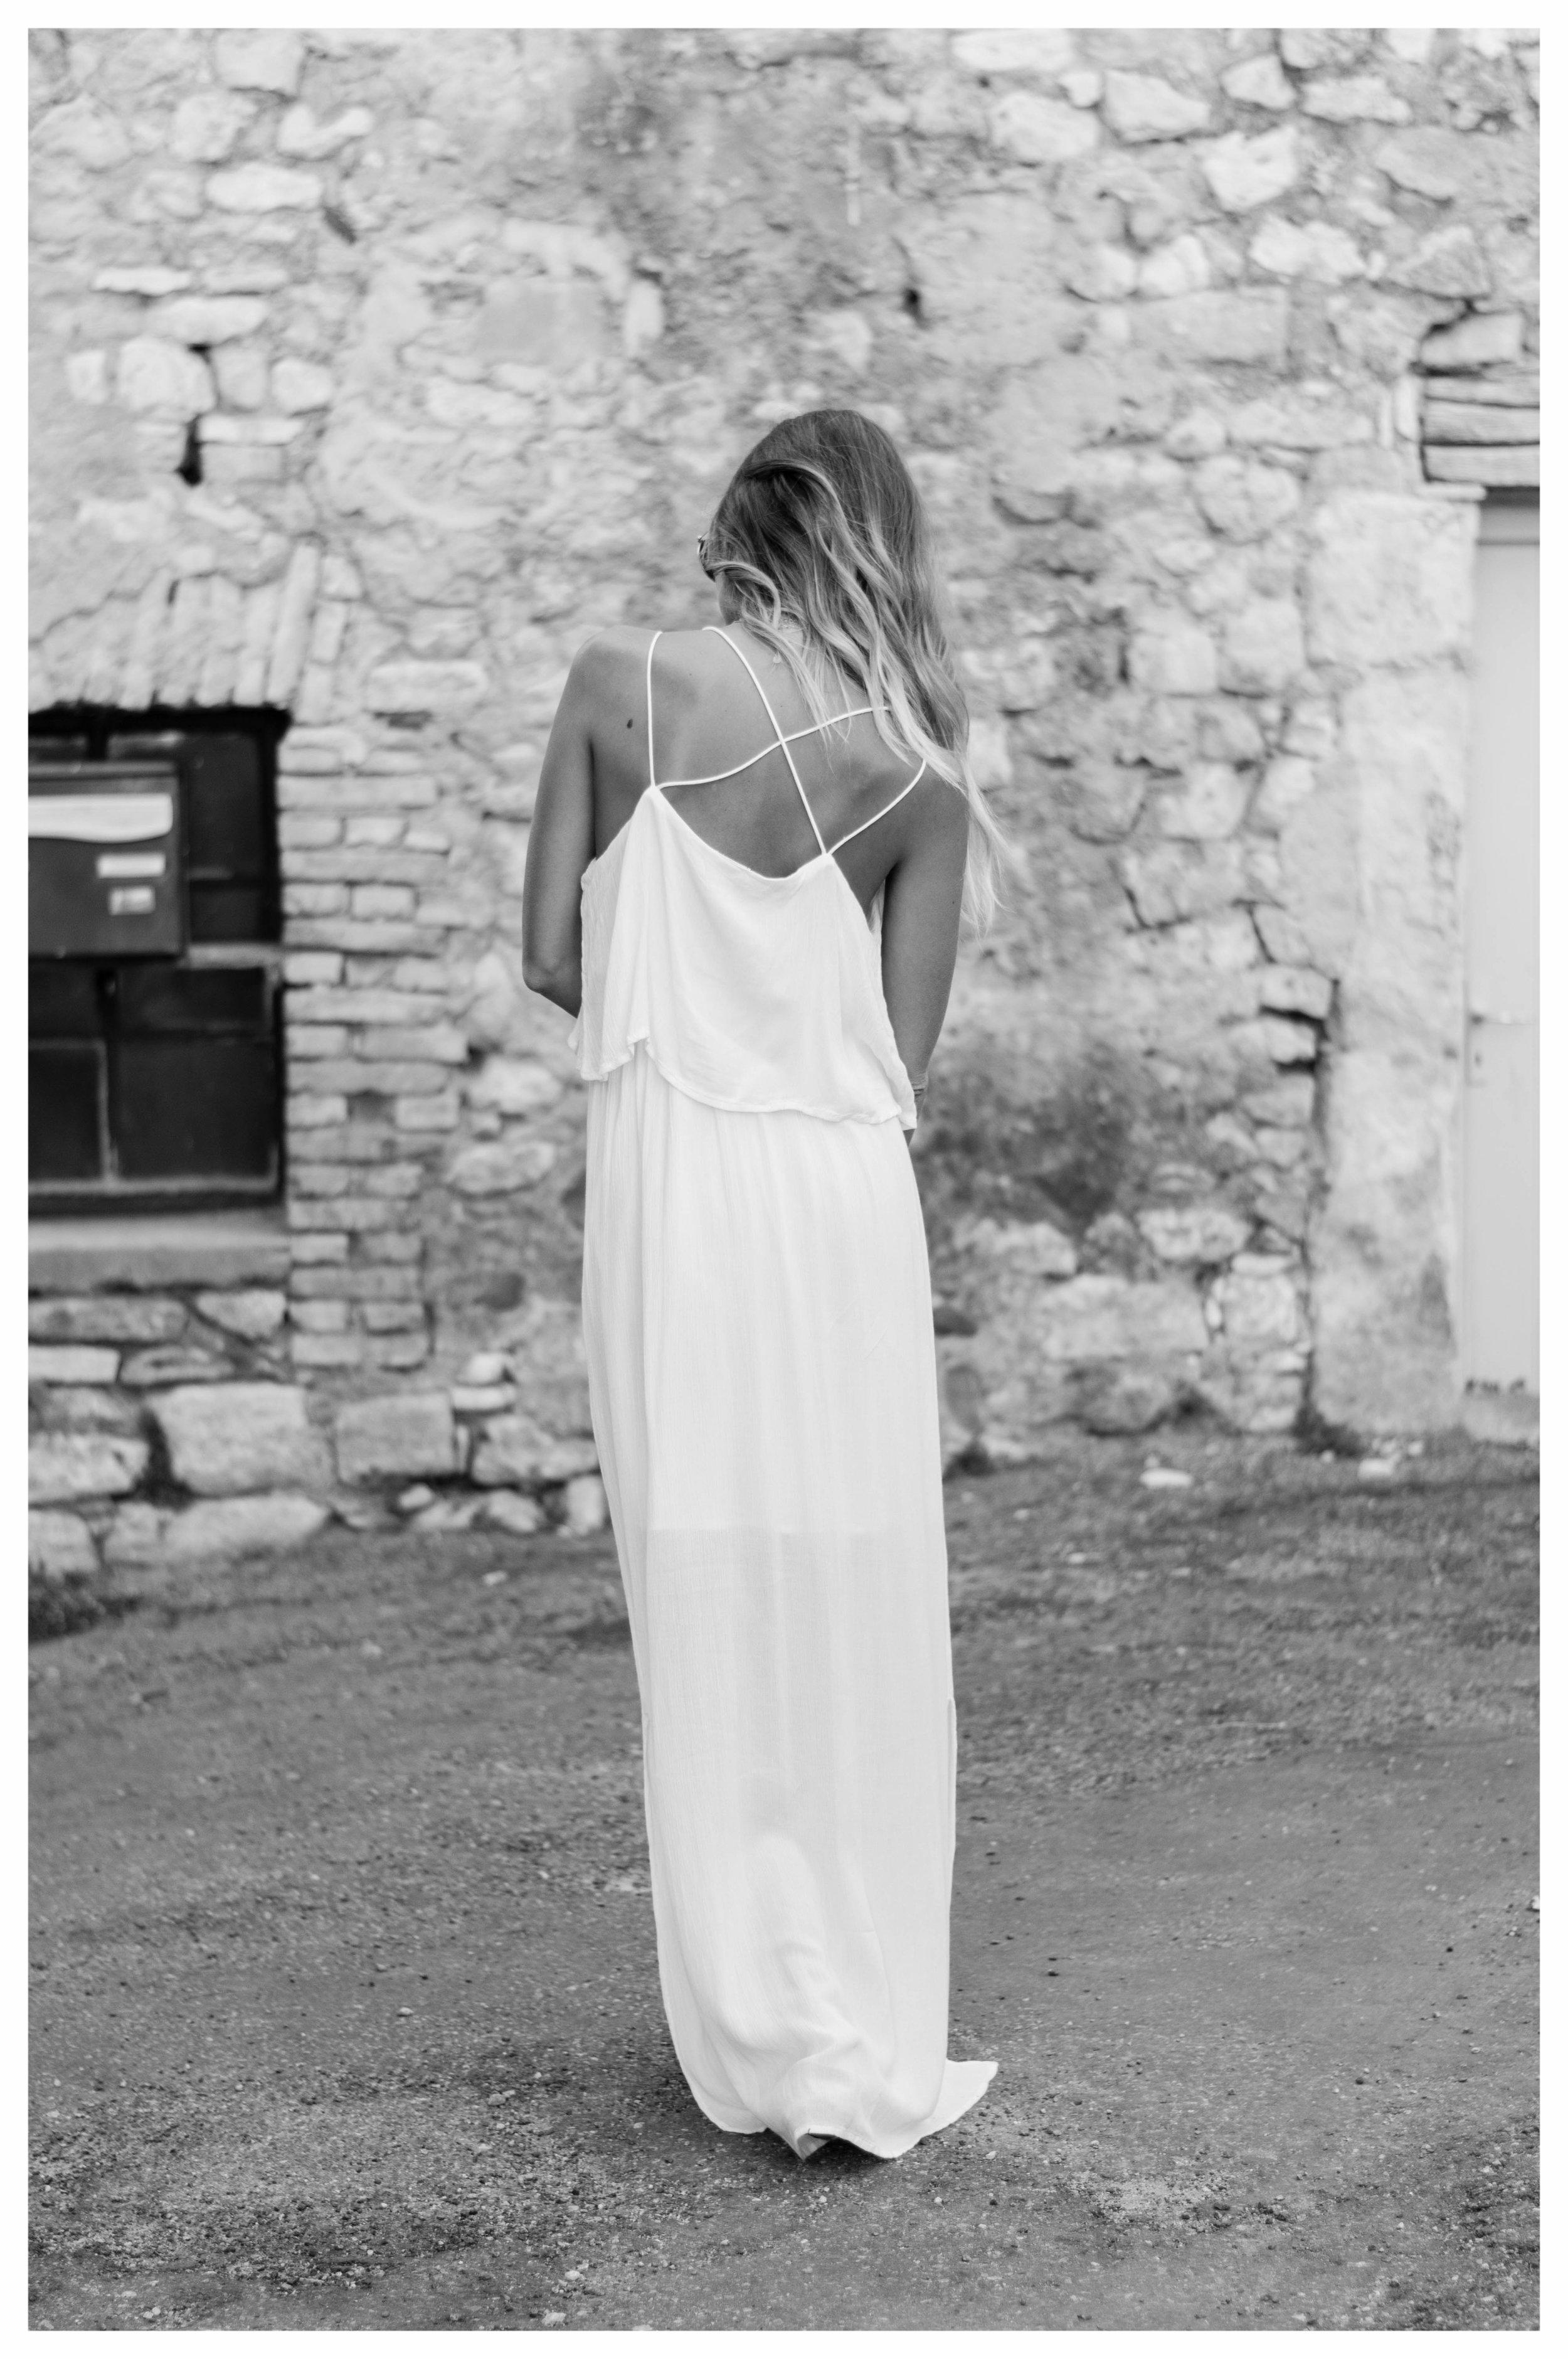 White Dress - OSIARAH.COM (10 sur 16).jpg